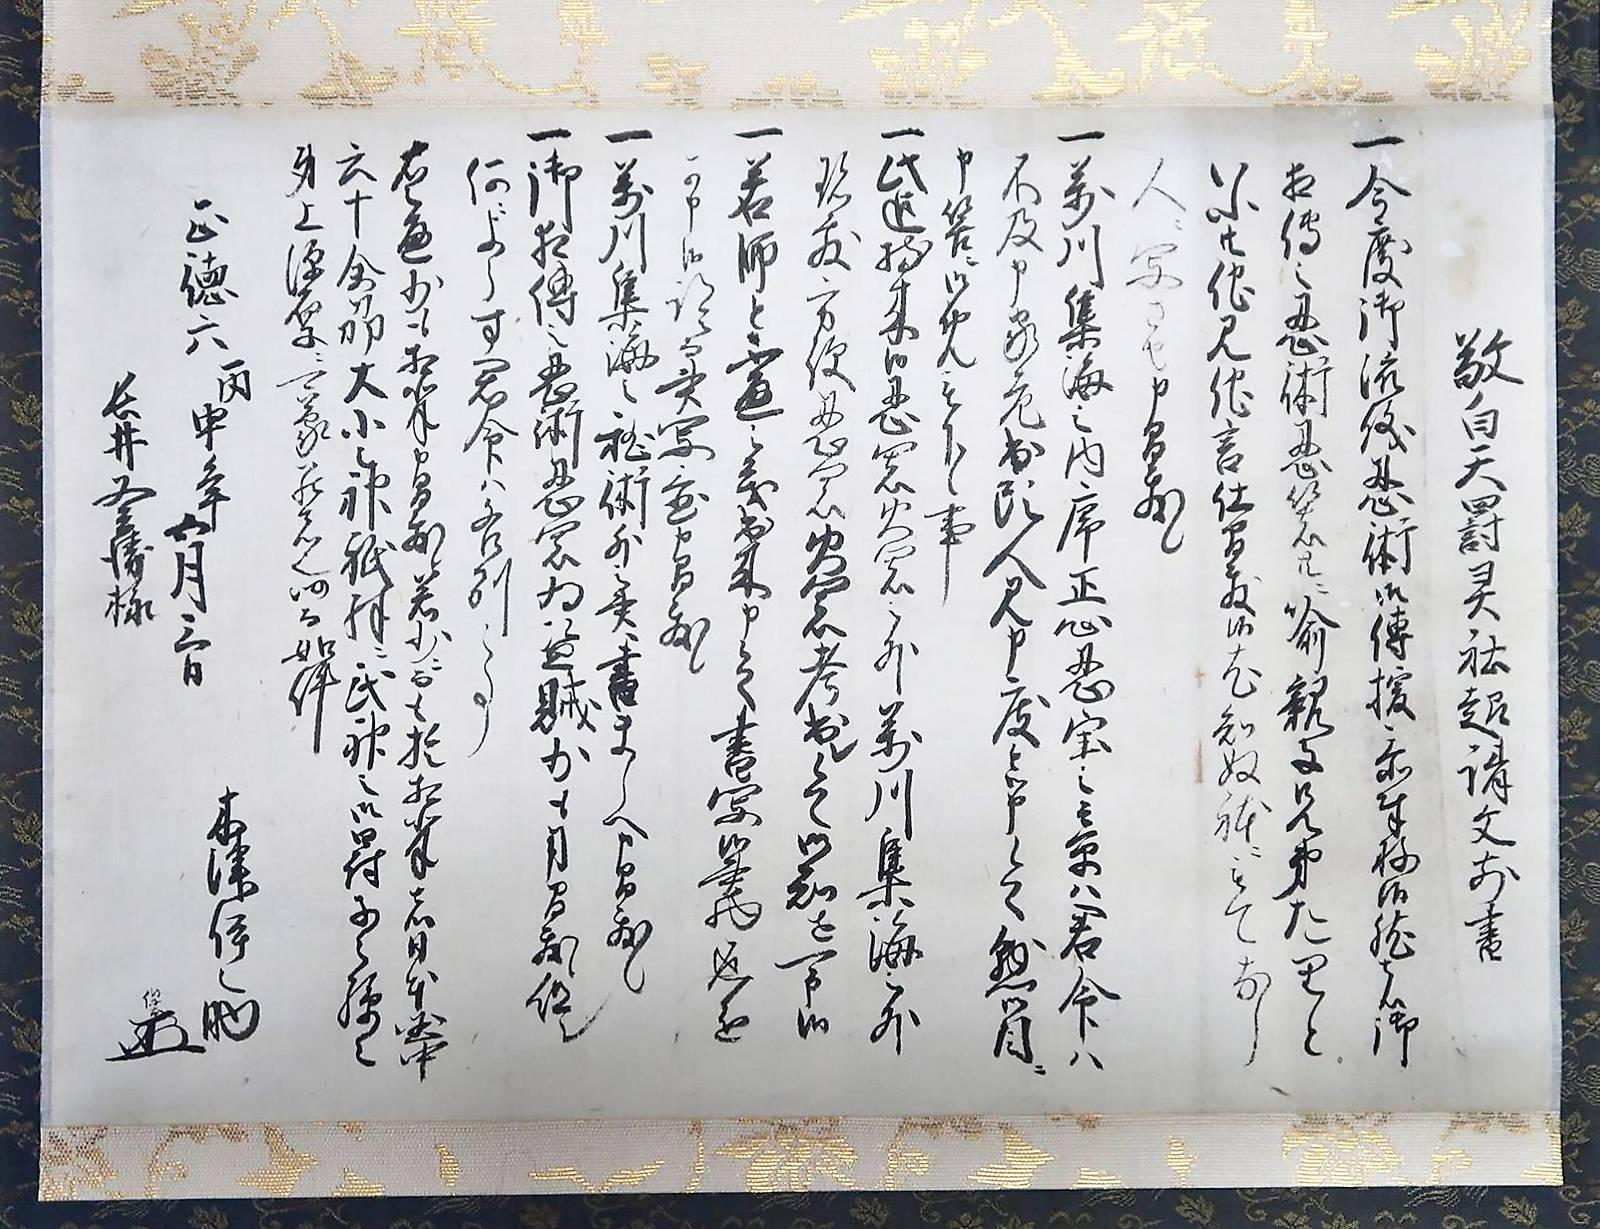 Geheimes Ninja-Dokument in Japan enthüllt